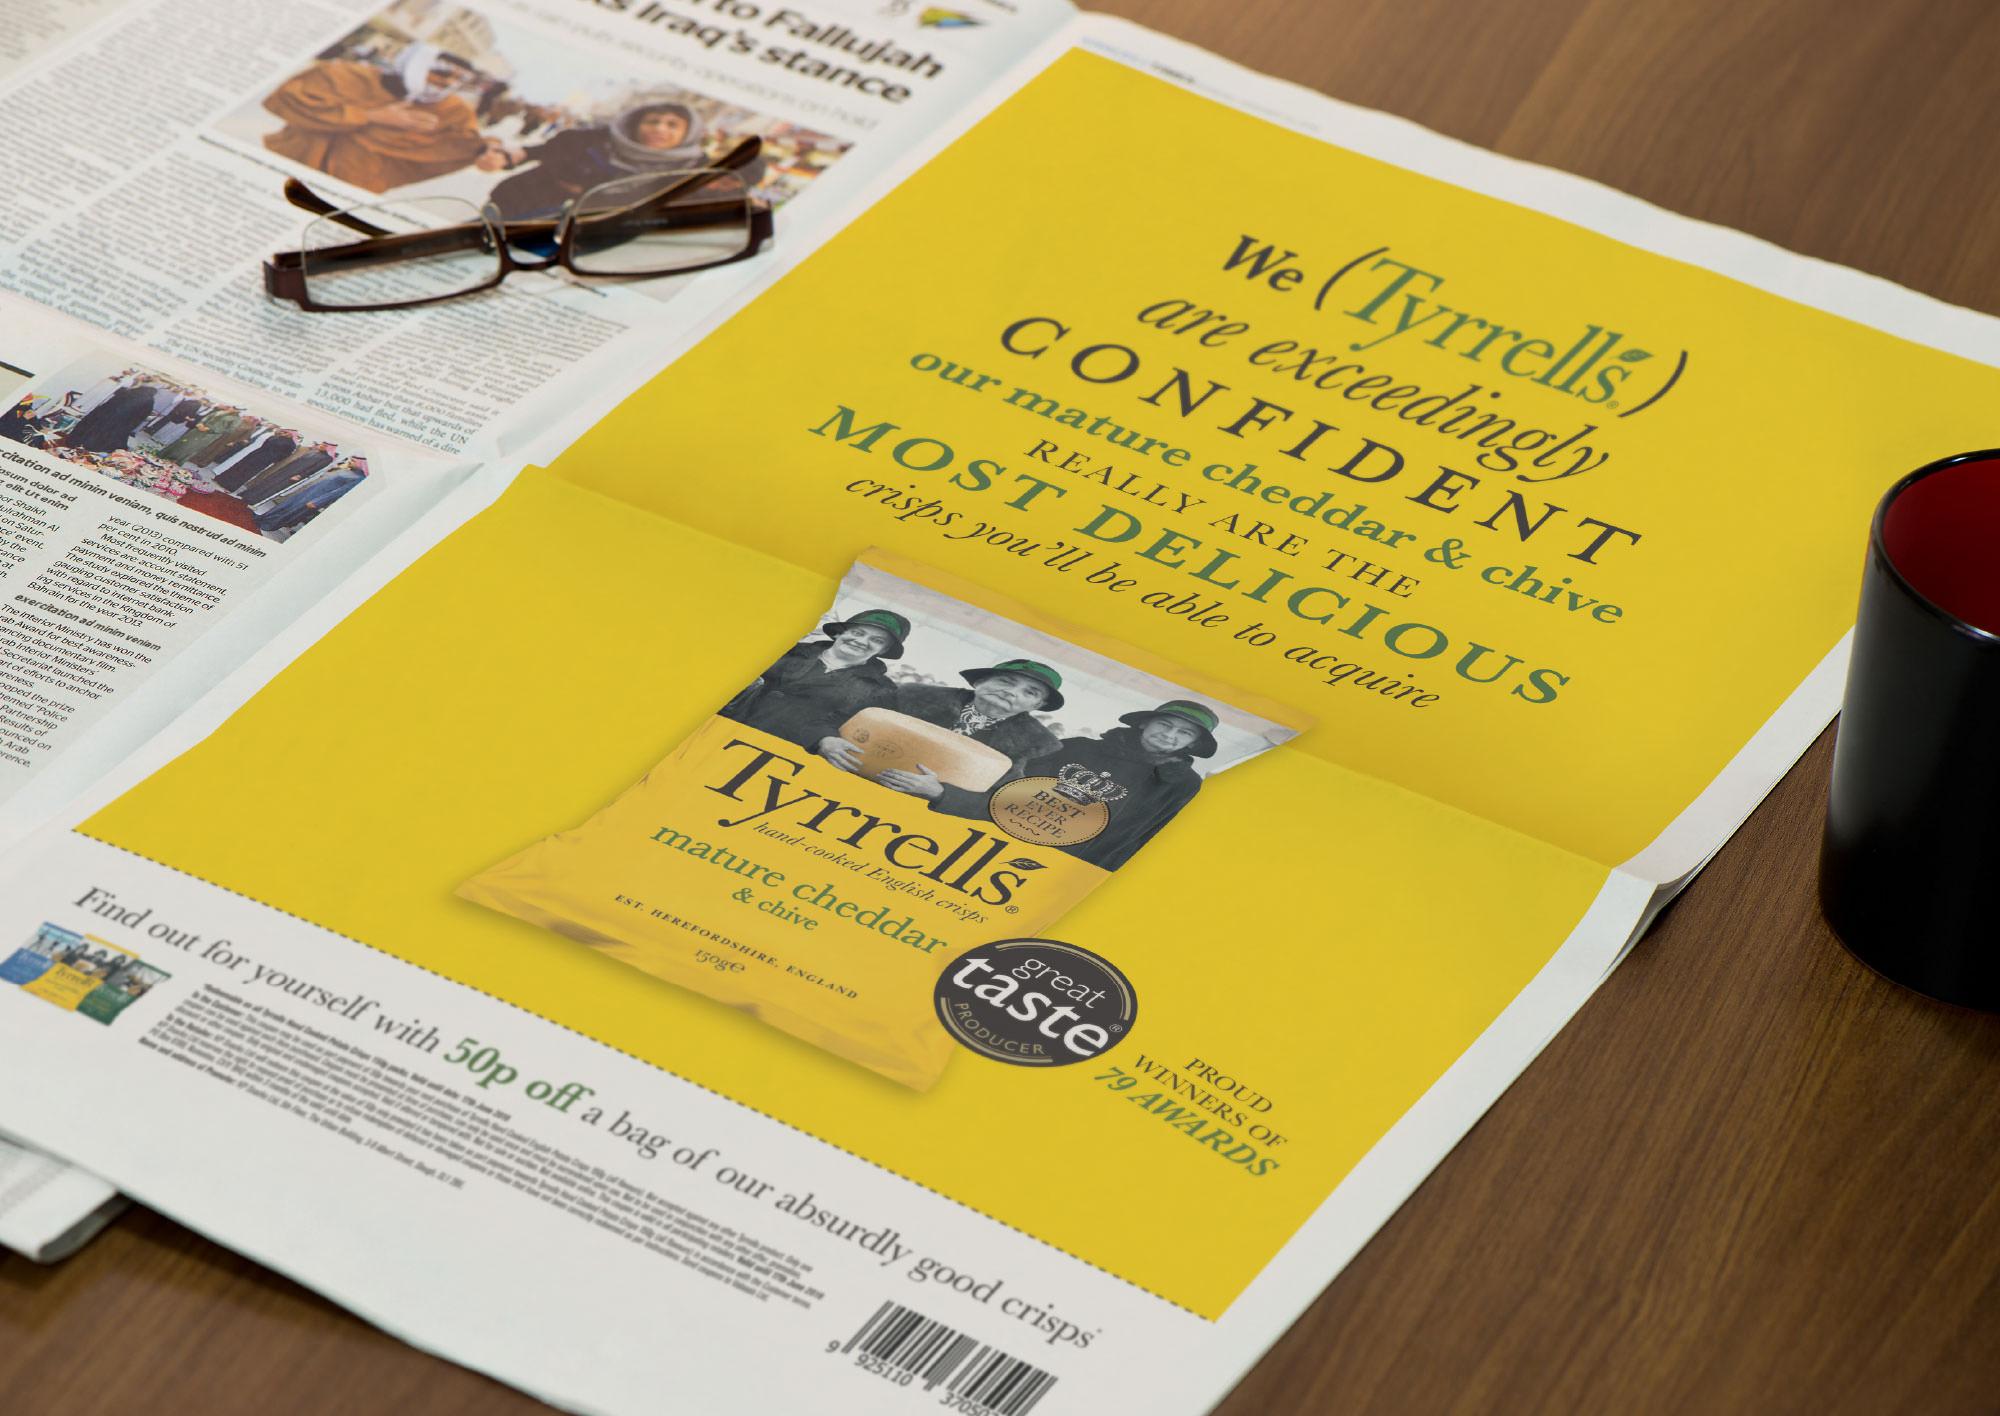 Tyrrells newspaper advert